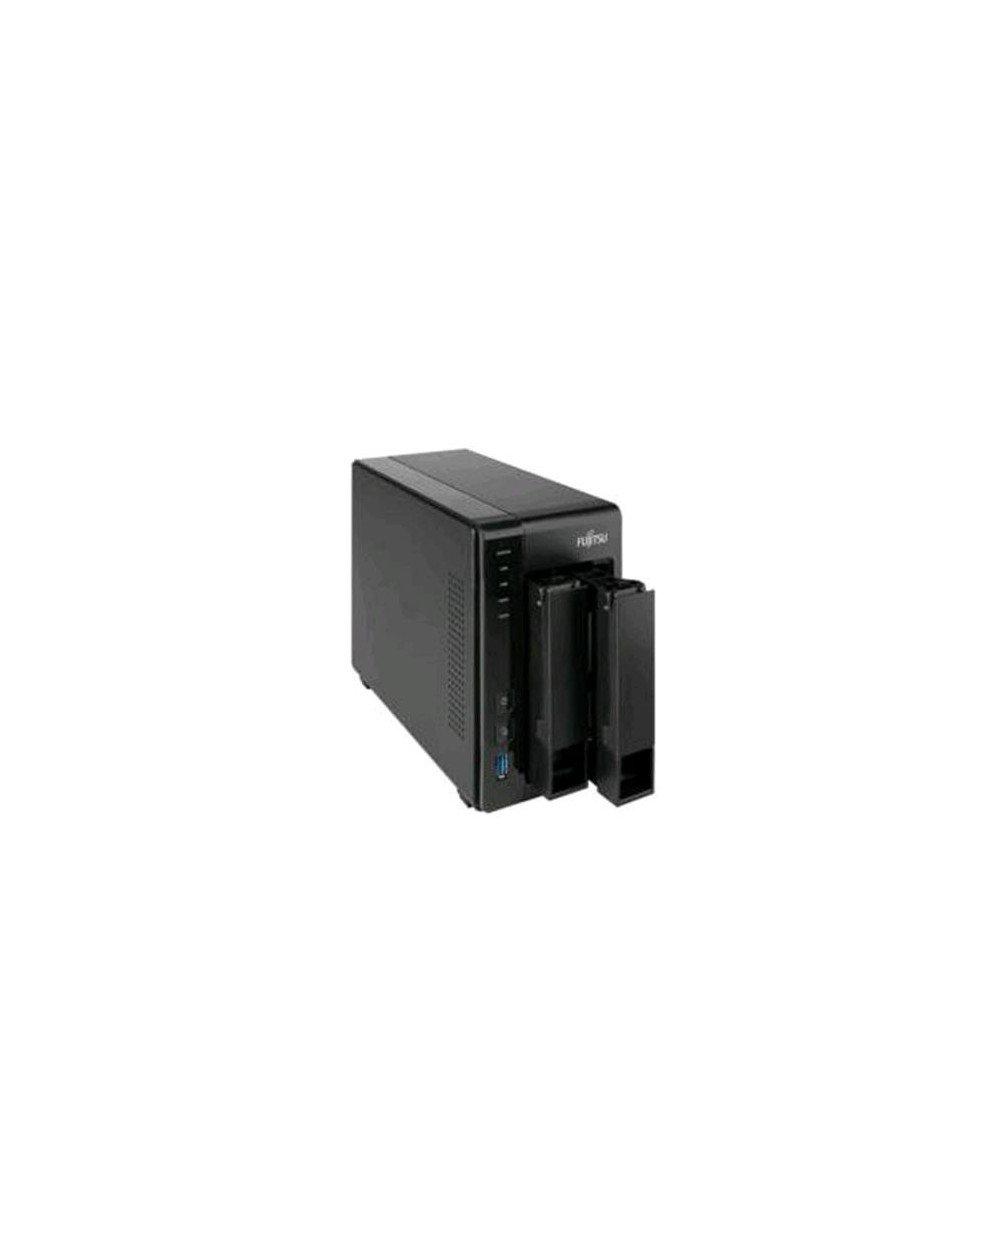 Fujitsu CELVIN NAS QE707 双托架无硬盘托盘带 HDD/SSD 安装螺钉 Erhaltlich